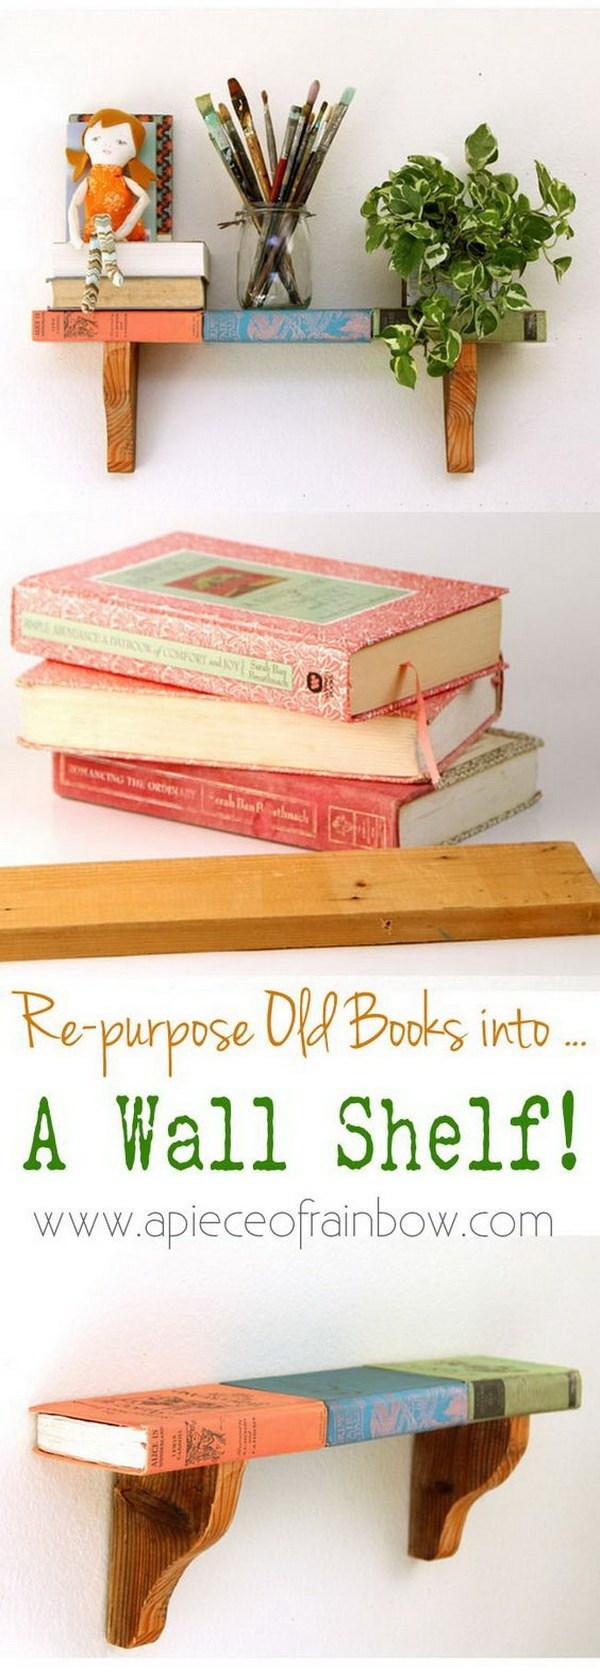 5. Re-purpose Wall Shelf